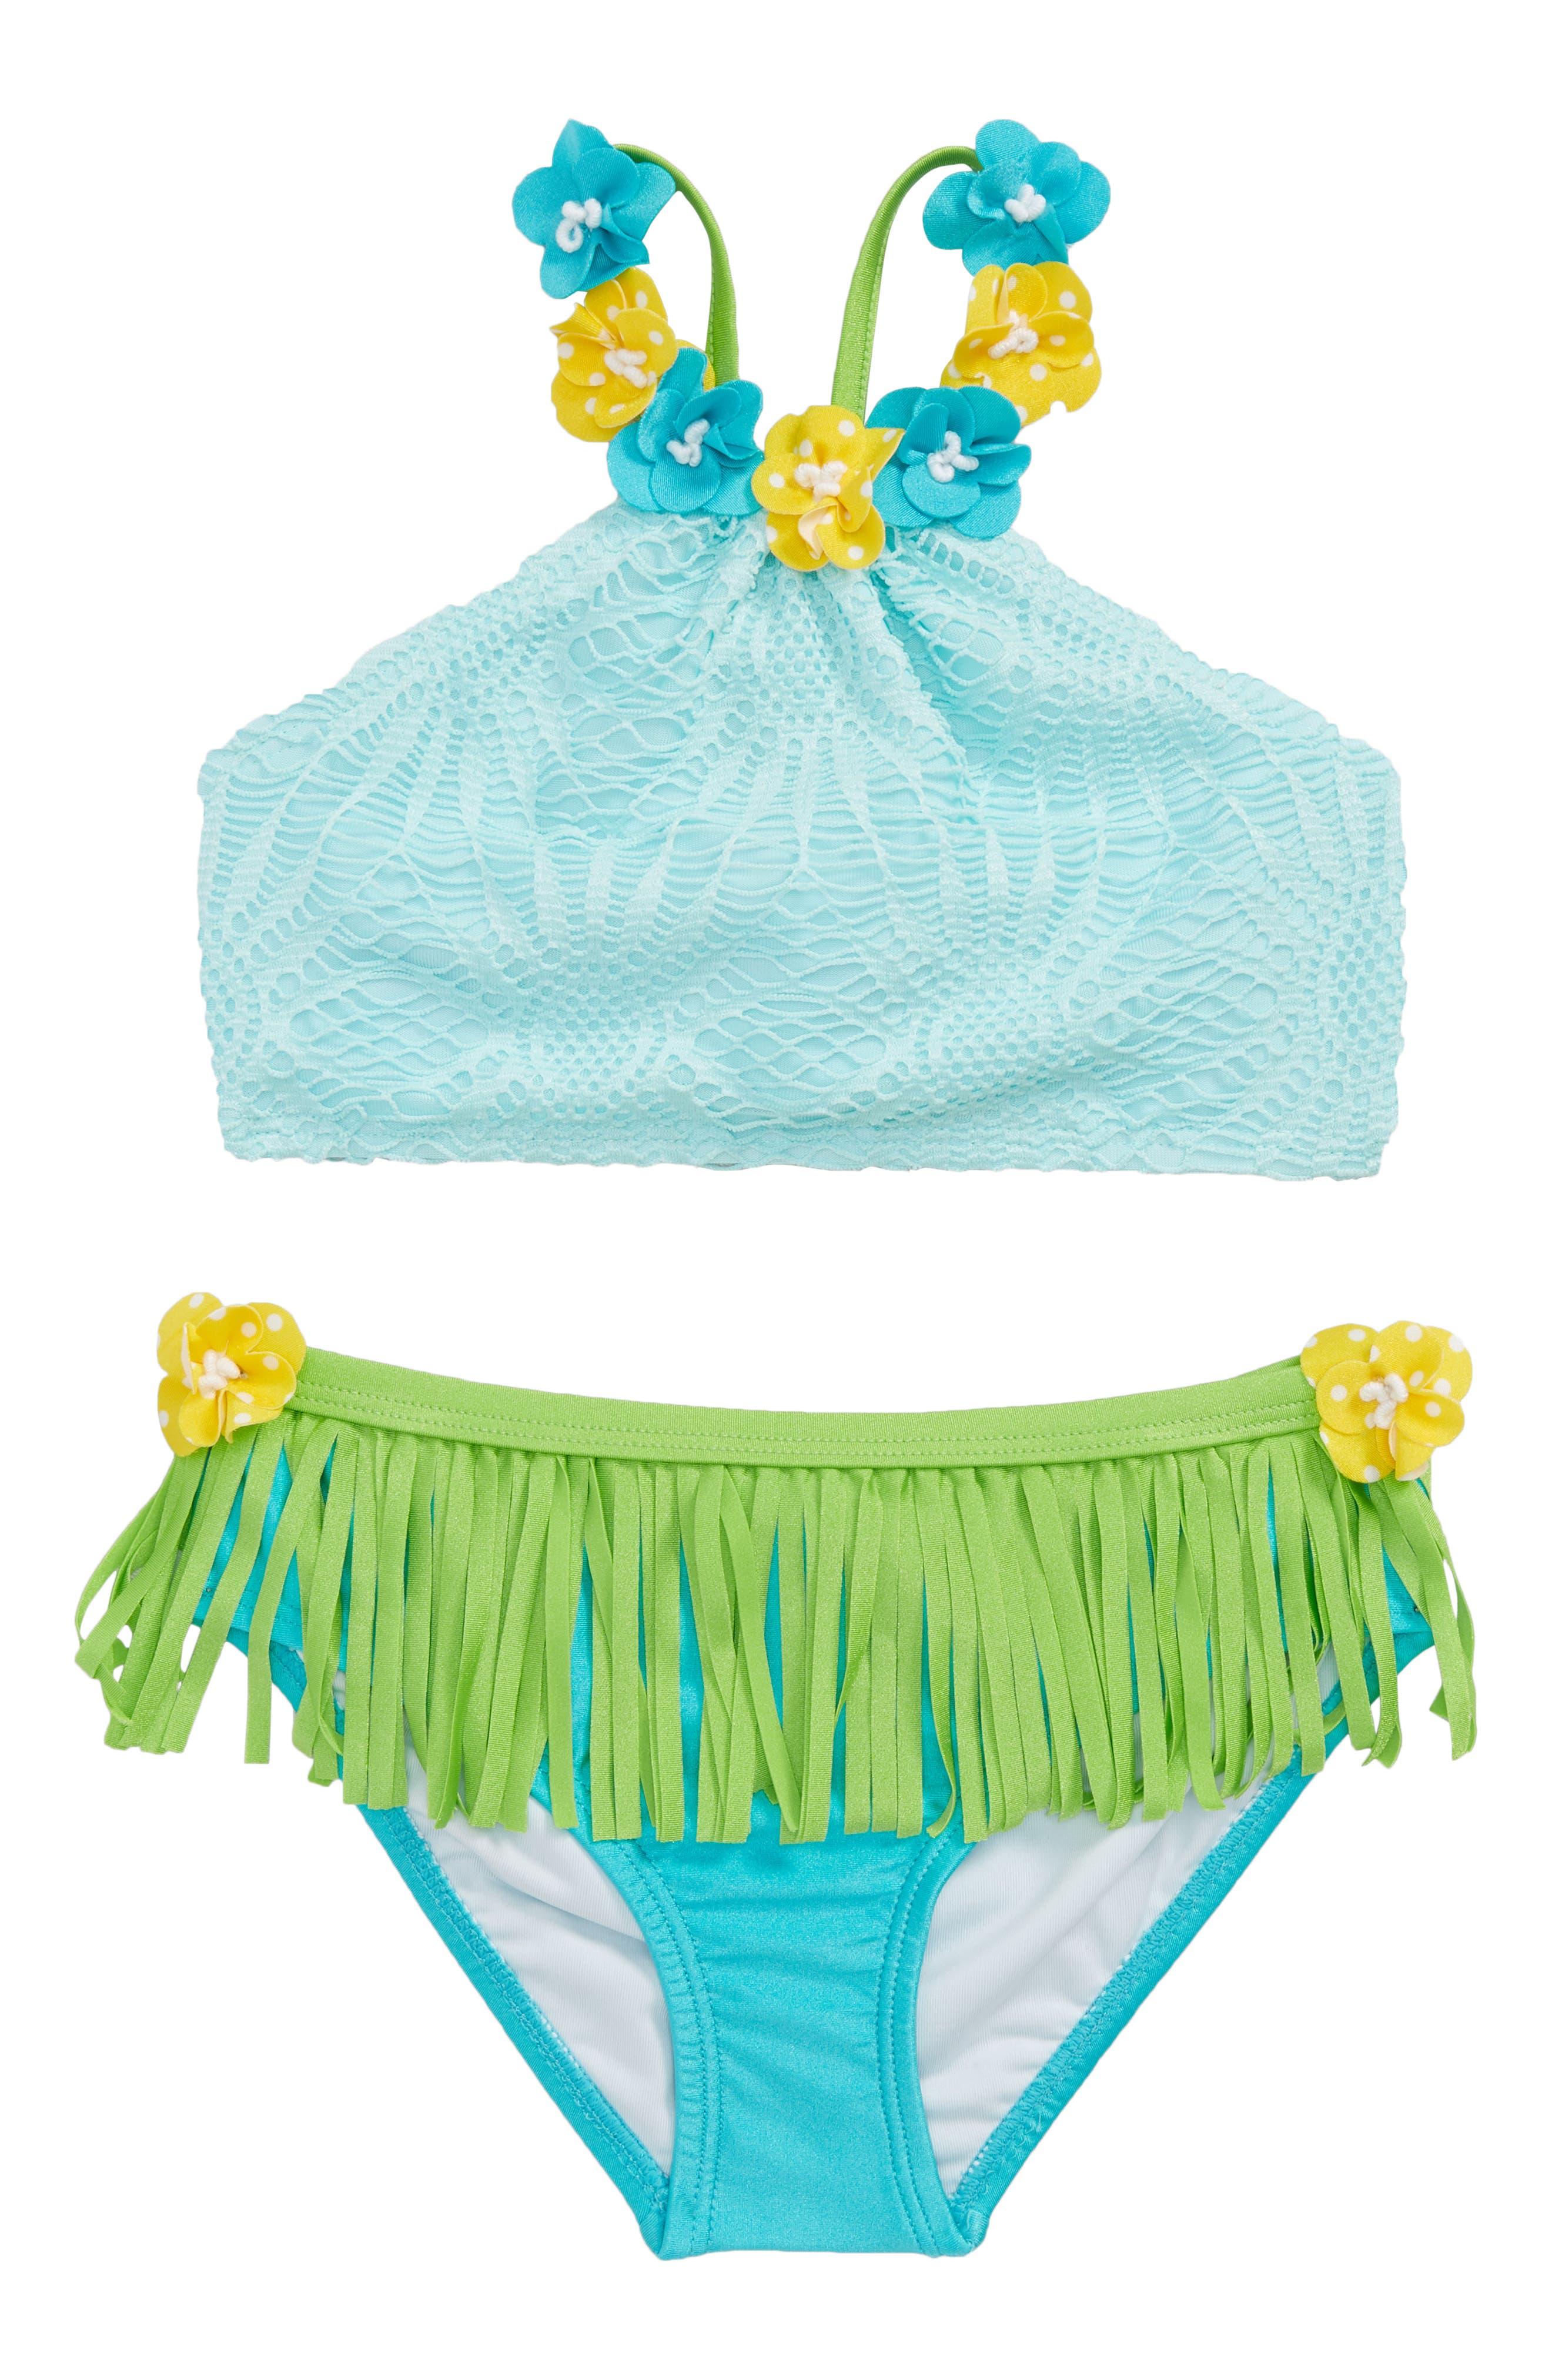 Hula Two-Piece Bikini Swimsuit,                         Main,                         color, Aqua